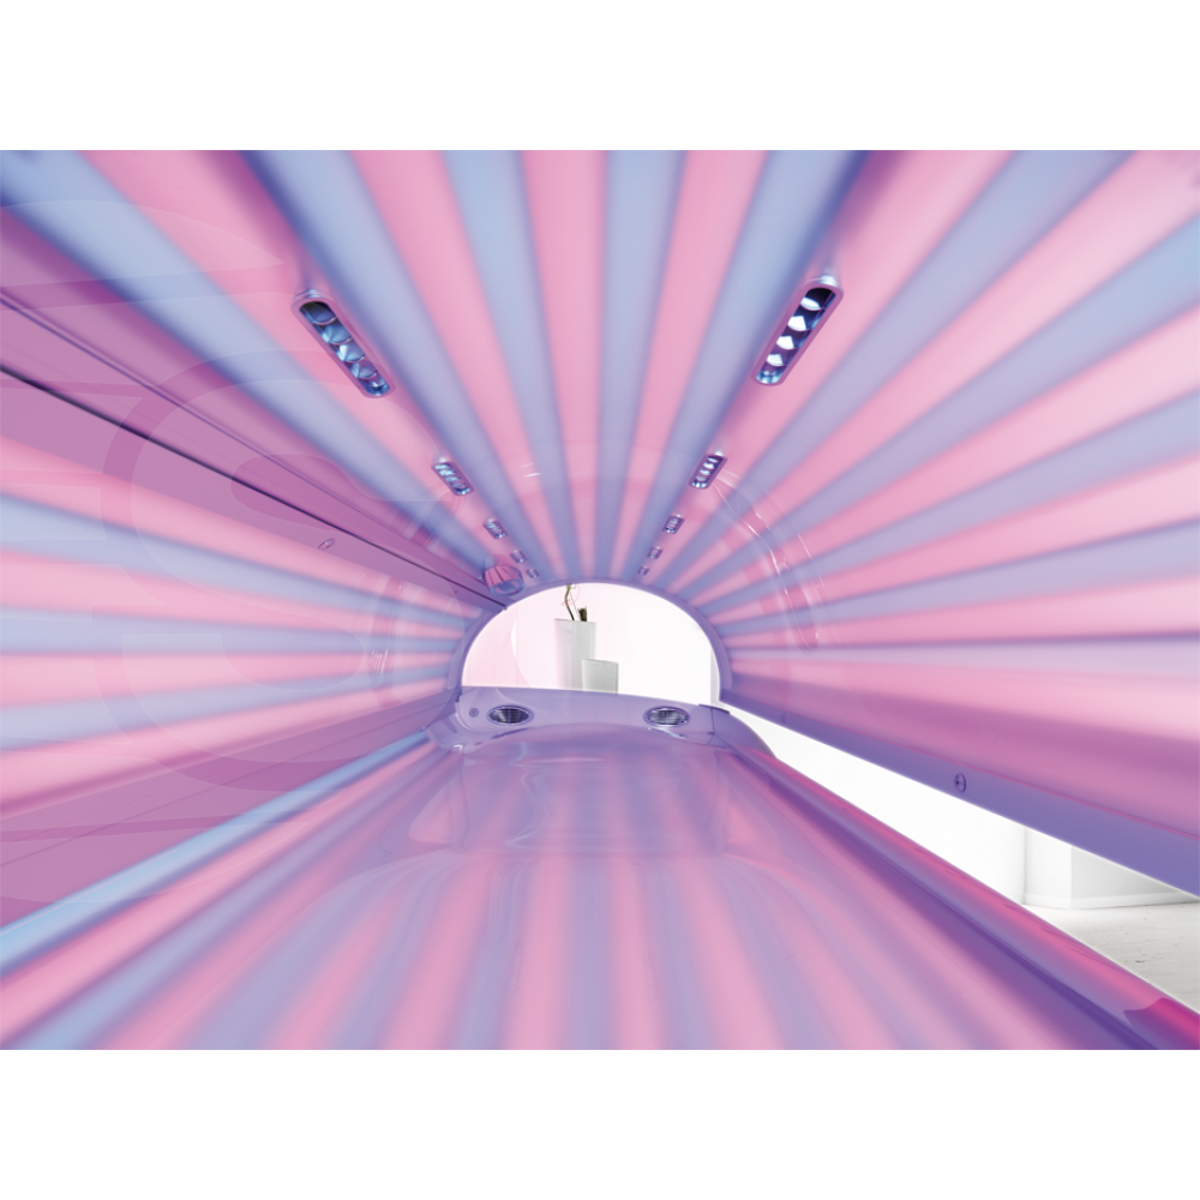 Megasun Collarium Mon Amie Deluxe I - Lettini Abbronzanti Megasun - Megasun